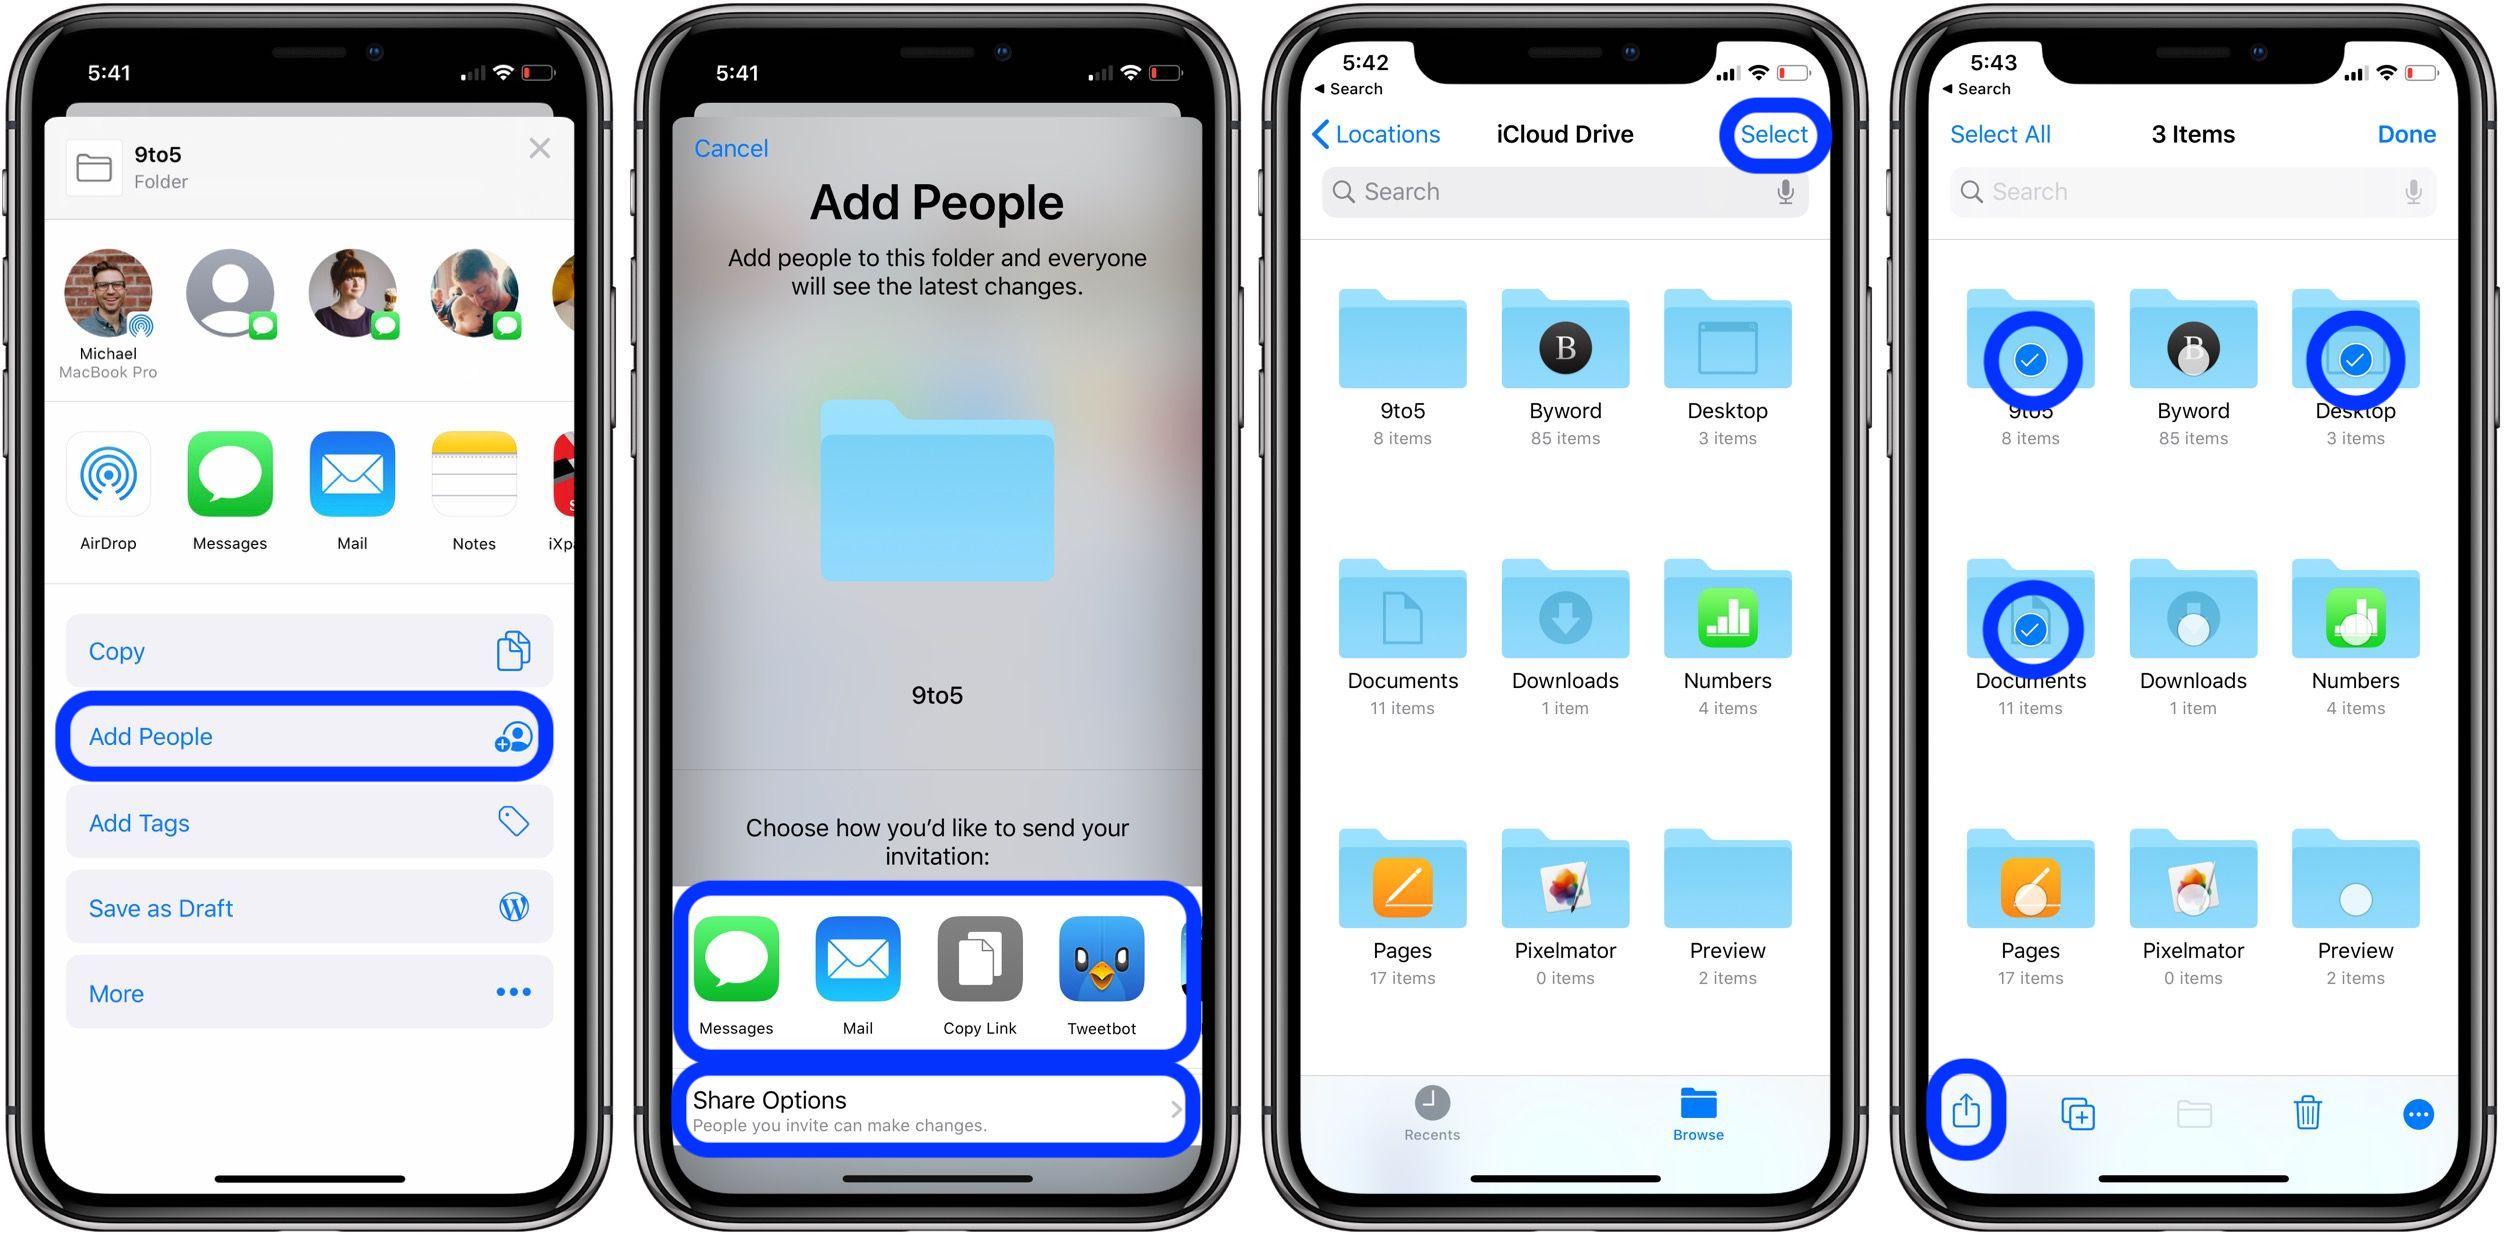 iOS 13 教程:如何从 iPhone 和 iPad 共享 iCloud Drive 文件夹?